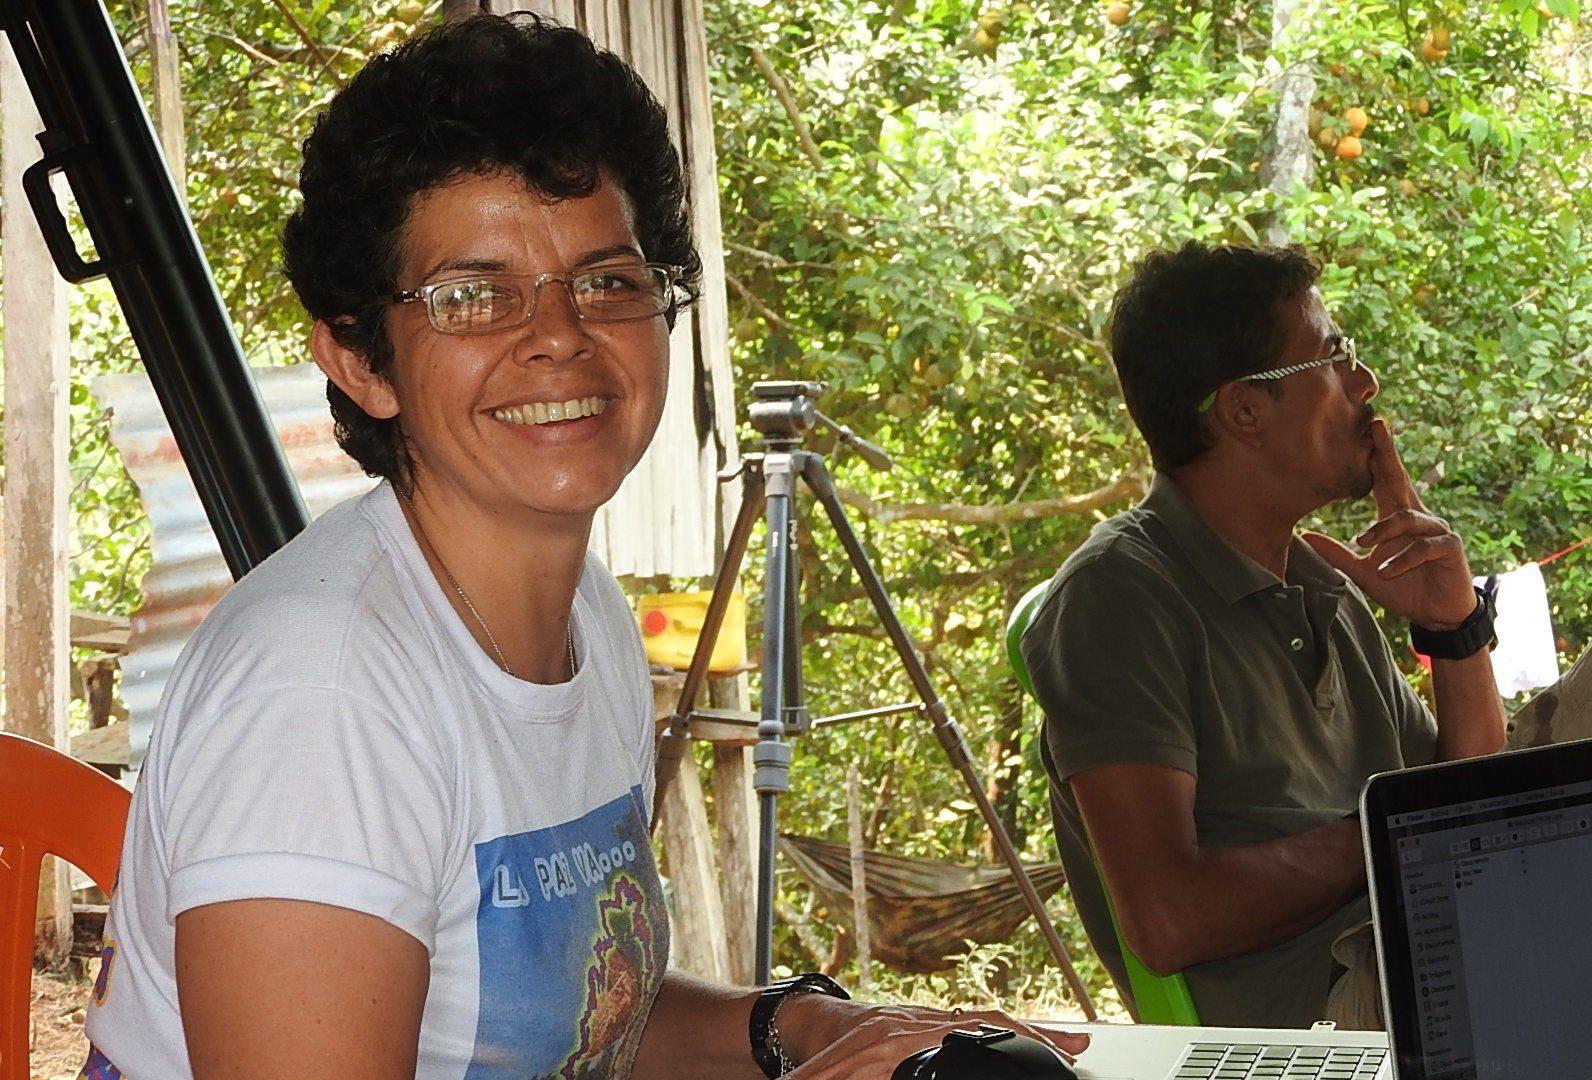 SNART ET NYTT LIV: Carmenza Castillo (46) har vært med i FARC siden 1984. Nå starter en ny tid.